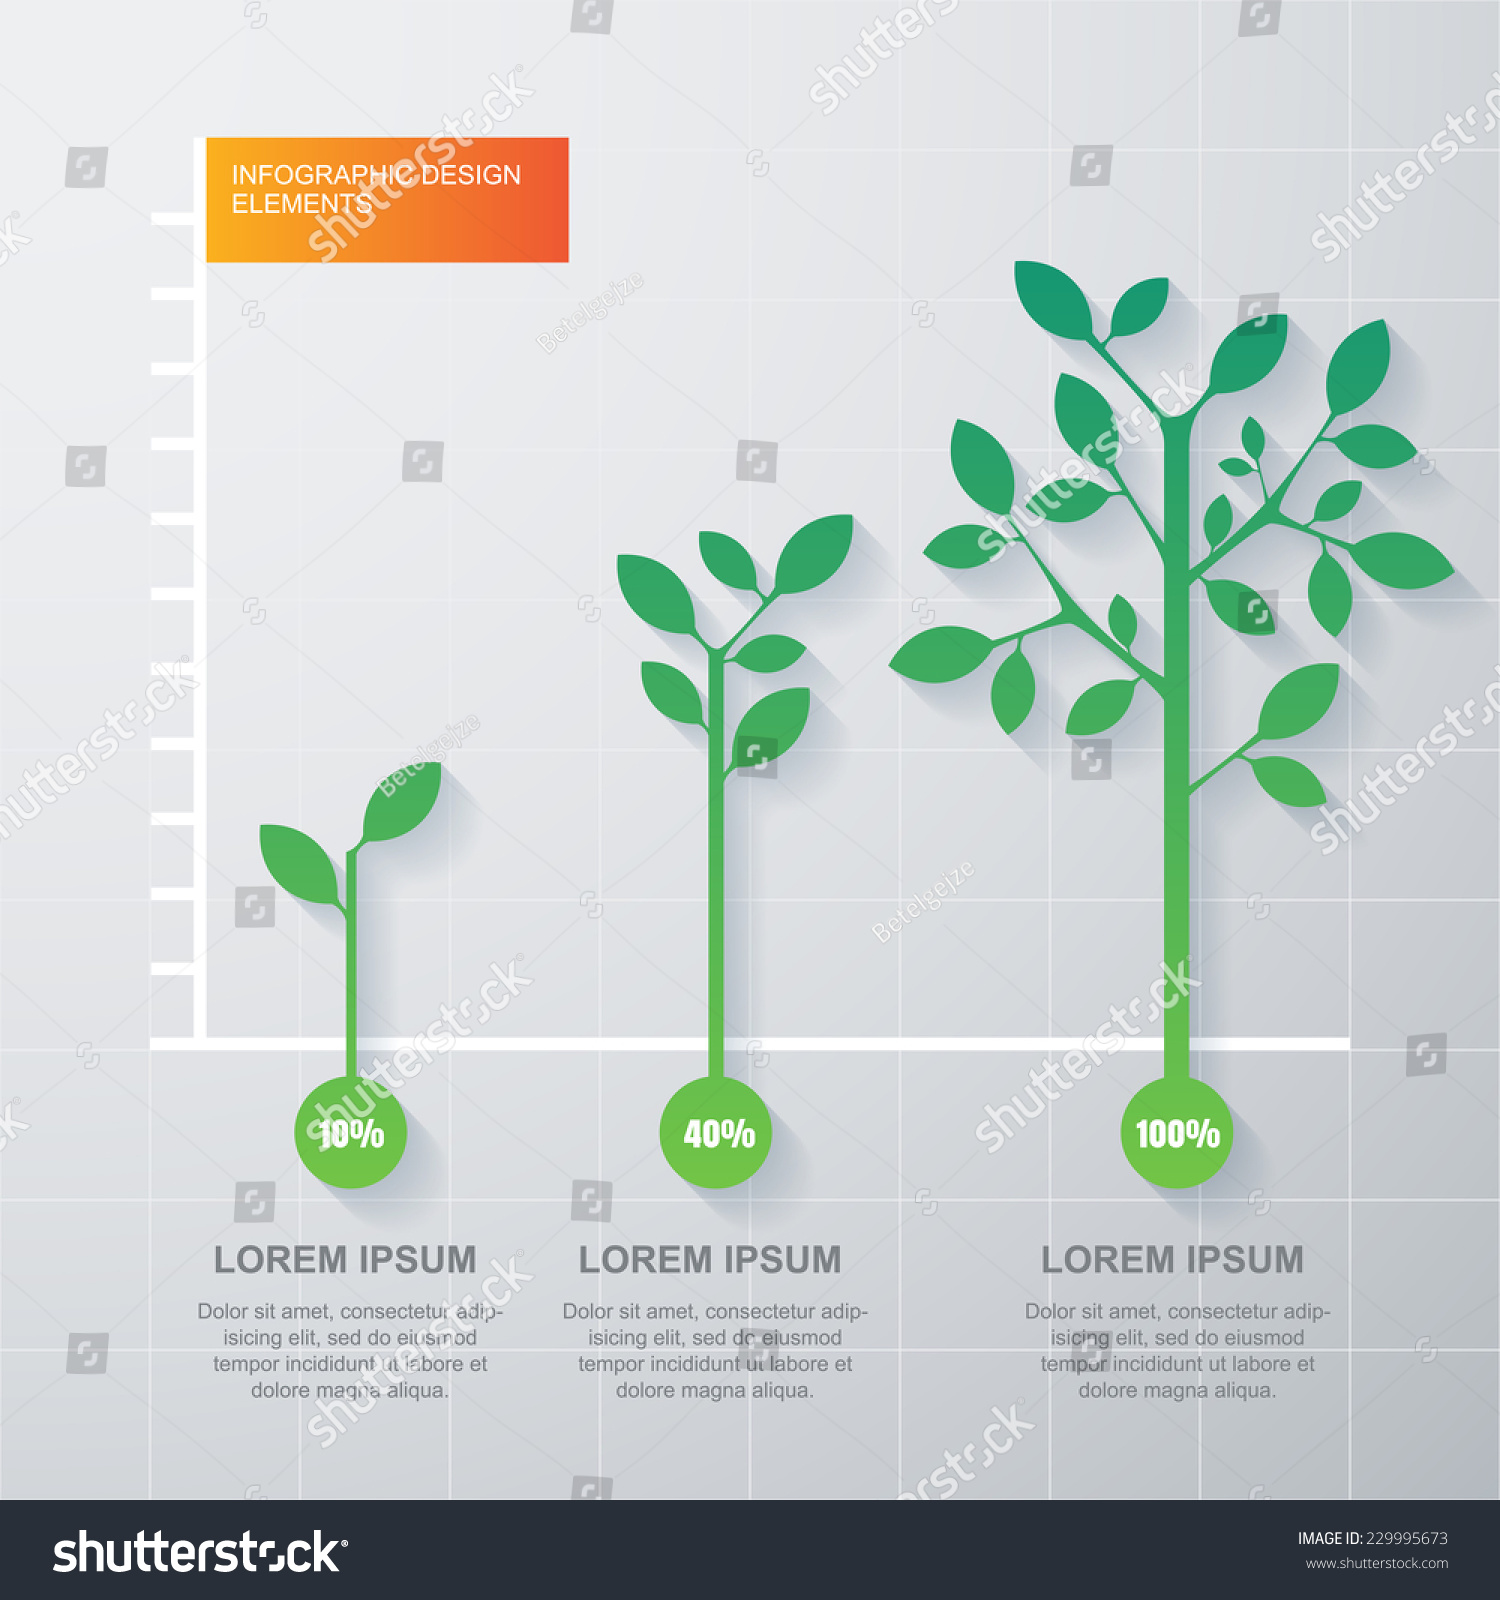 shrub graphic symbols diagram poulan lawn mower parts green tree plant infographics template stock